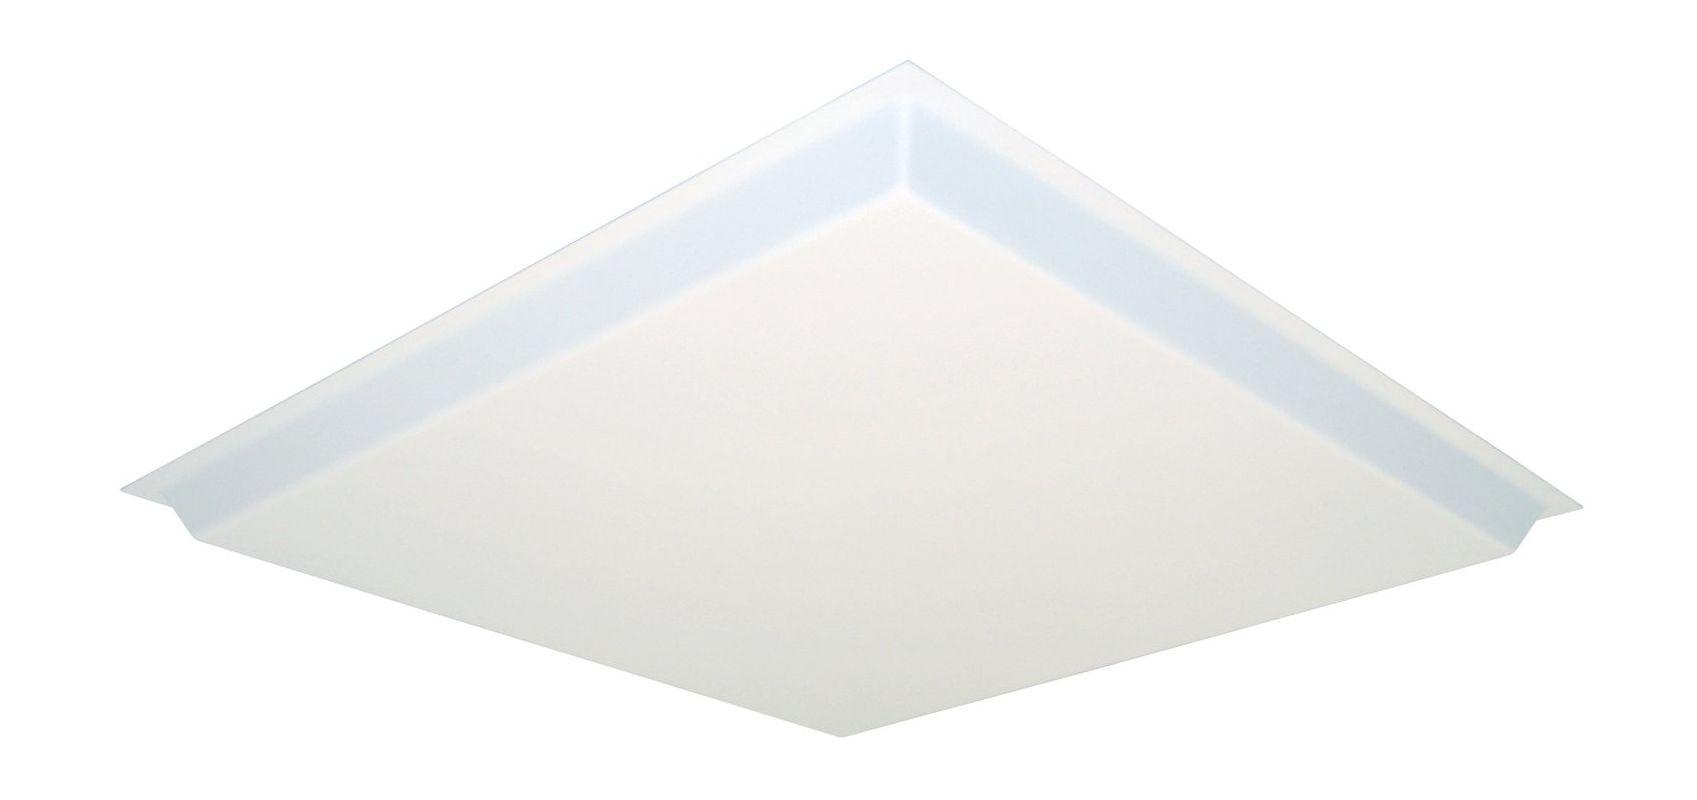 "Lithonia Lighting D2SBDDROP2 24"" x 24"" Dropped Diffuser White"